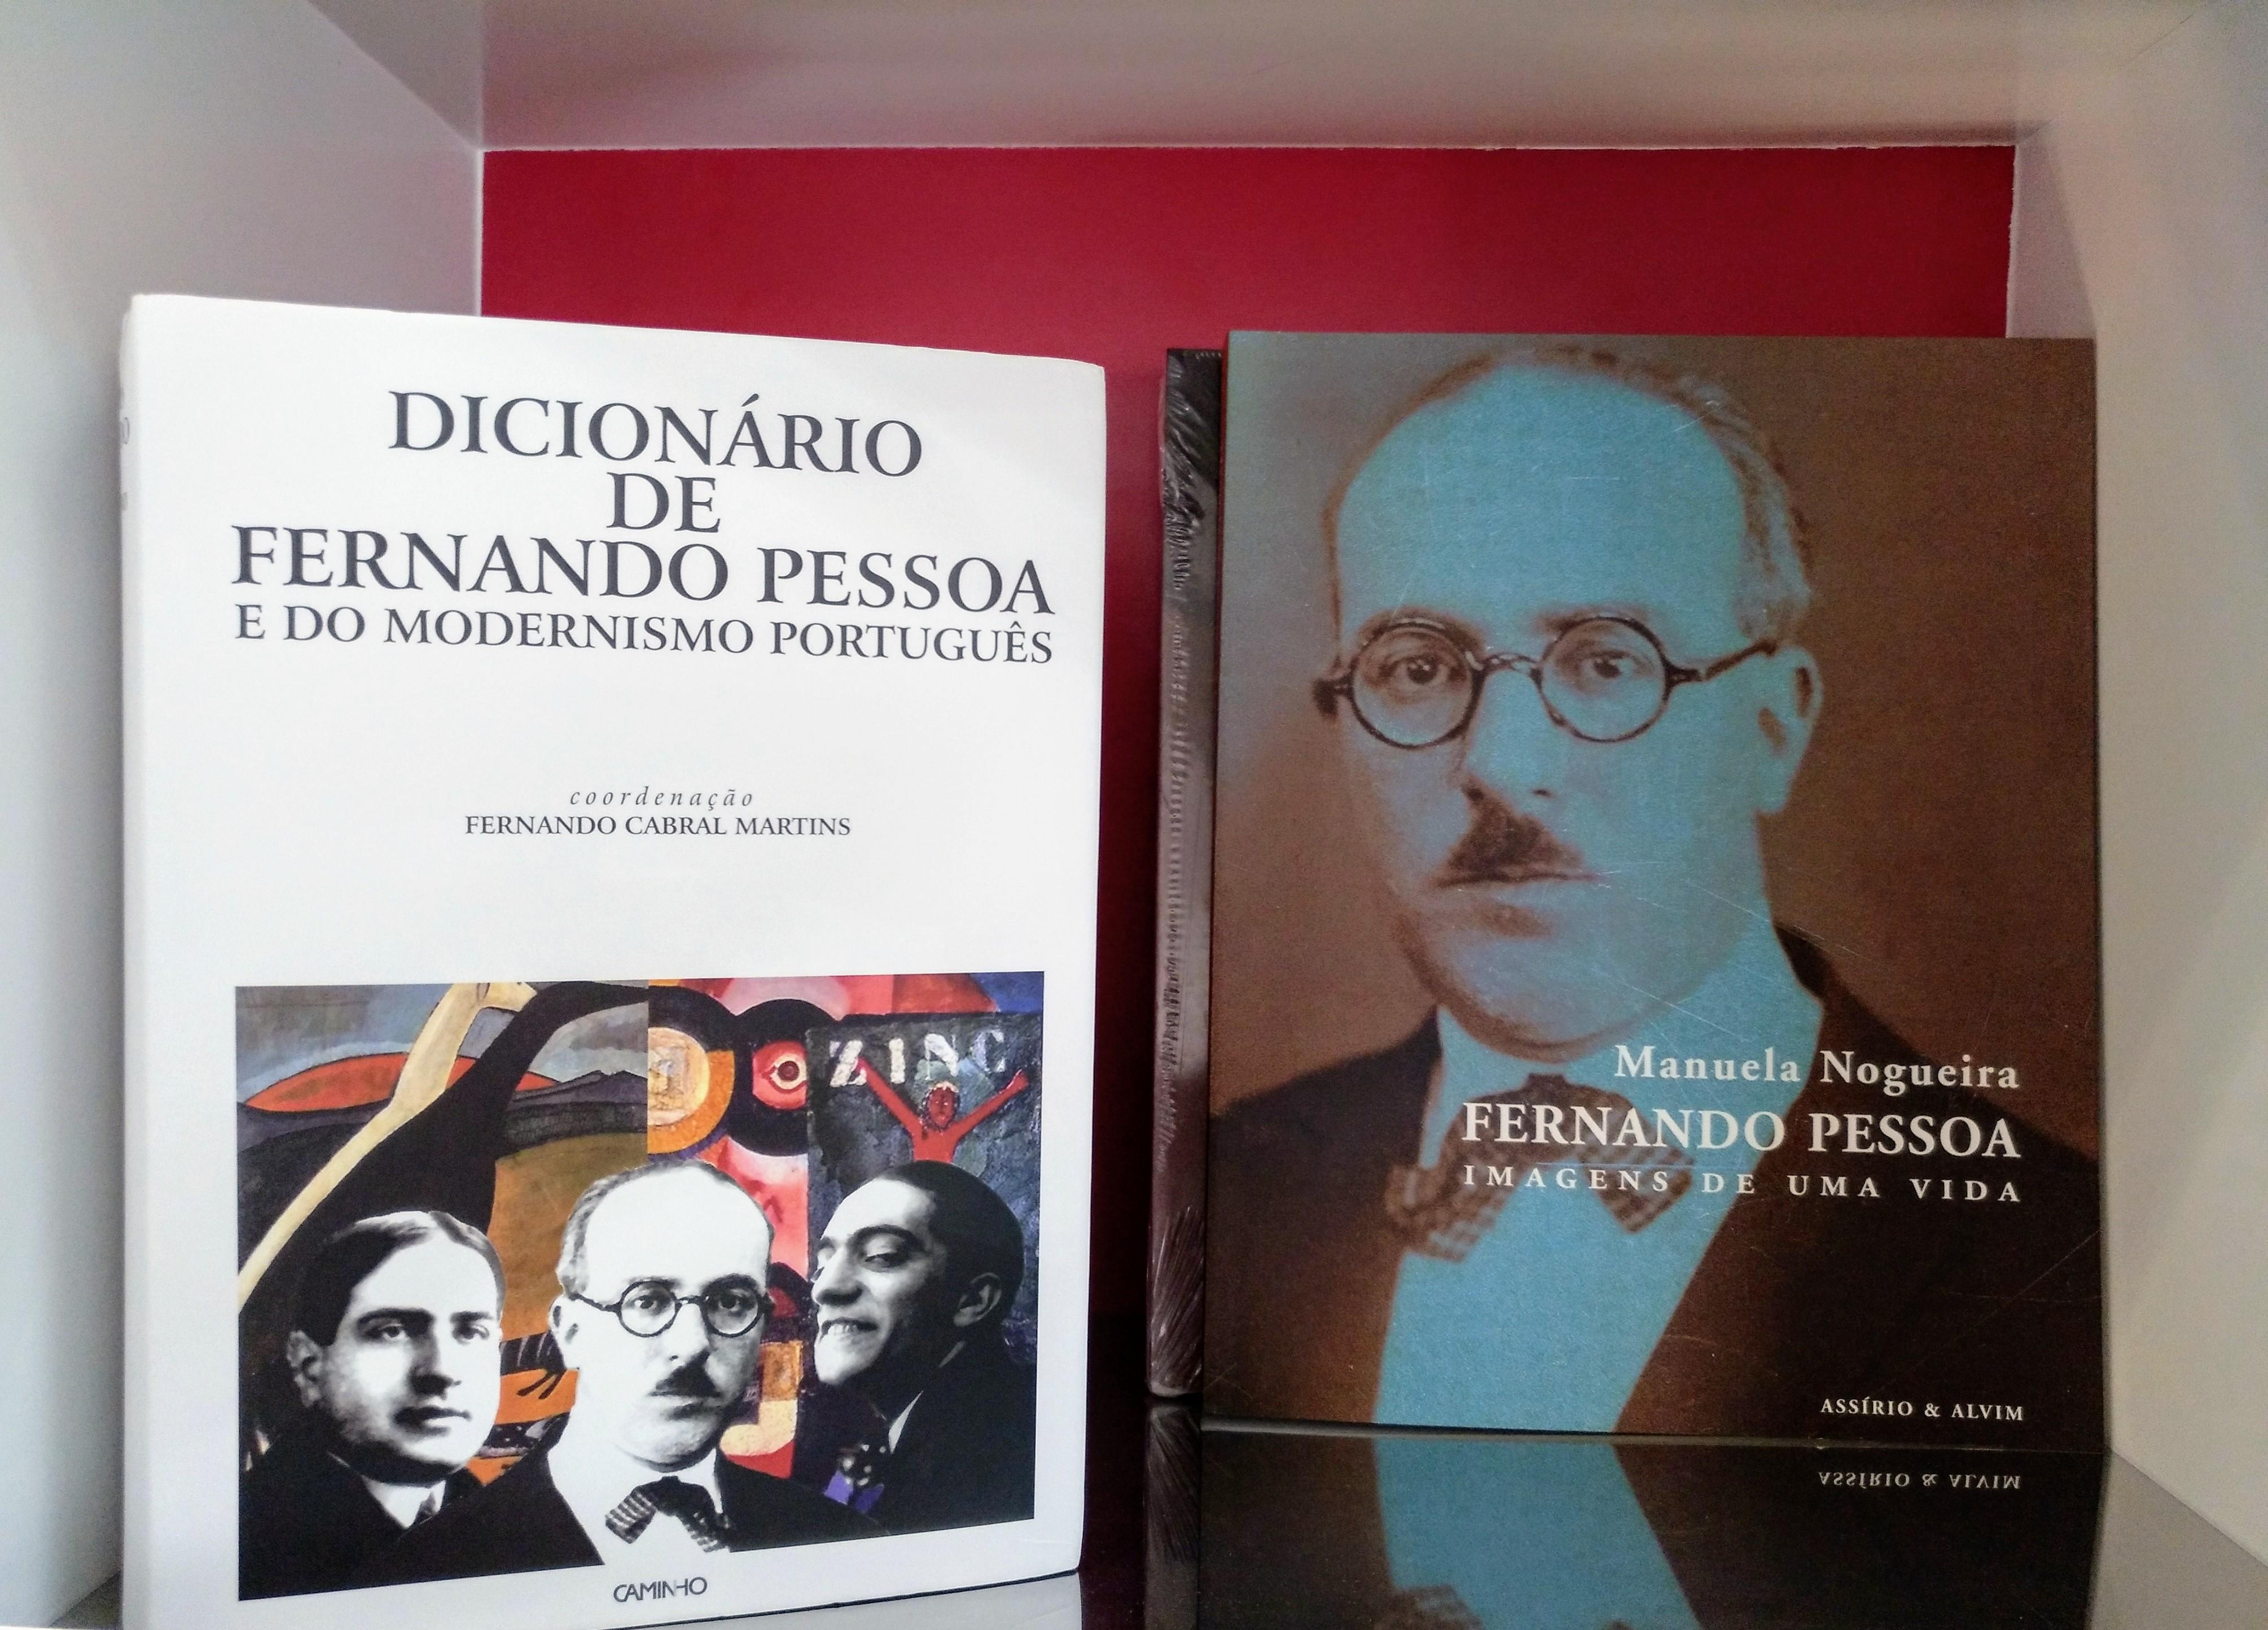 libros de fernando pessoa de la casa museo en campo de ourique_lisboa